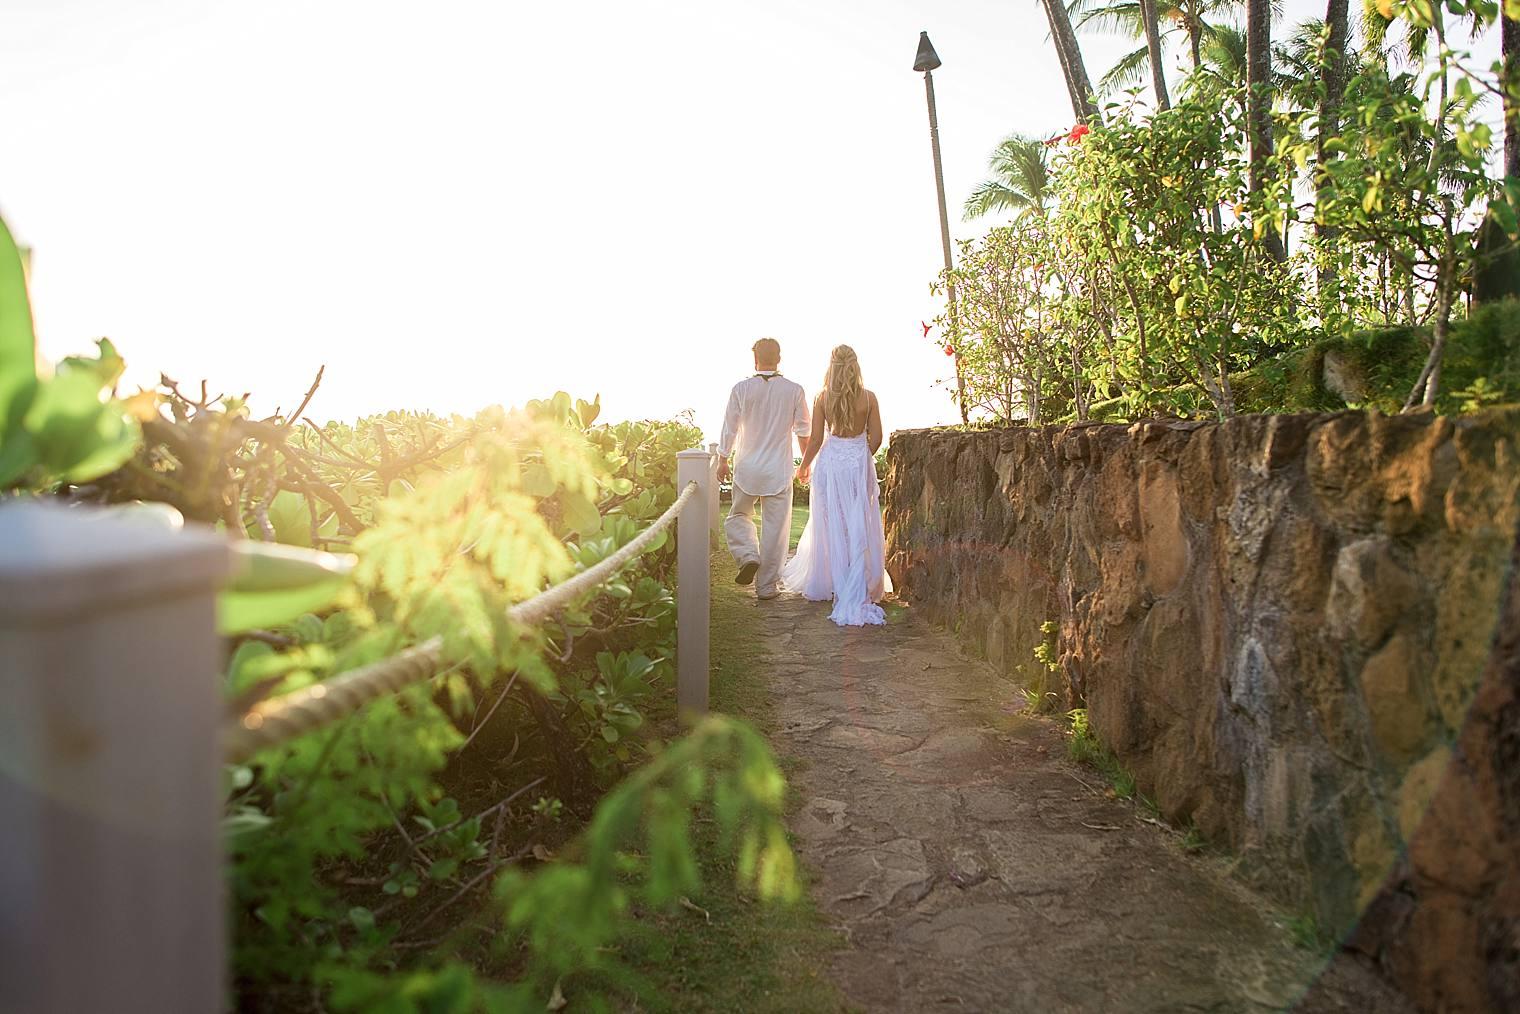 Destination Wedding at Sea House Napili - Maui Wedding Photographer_0026